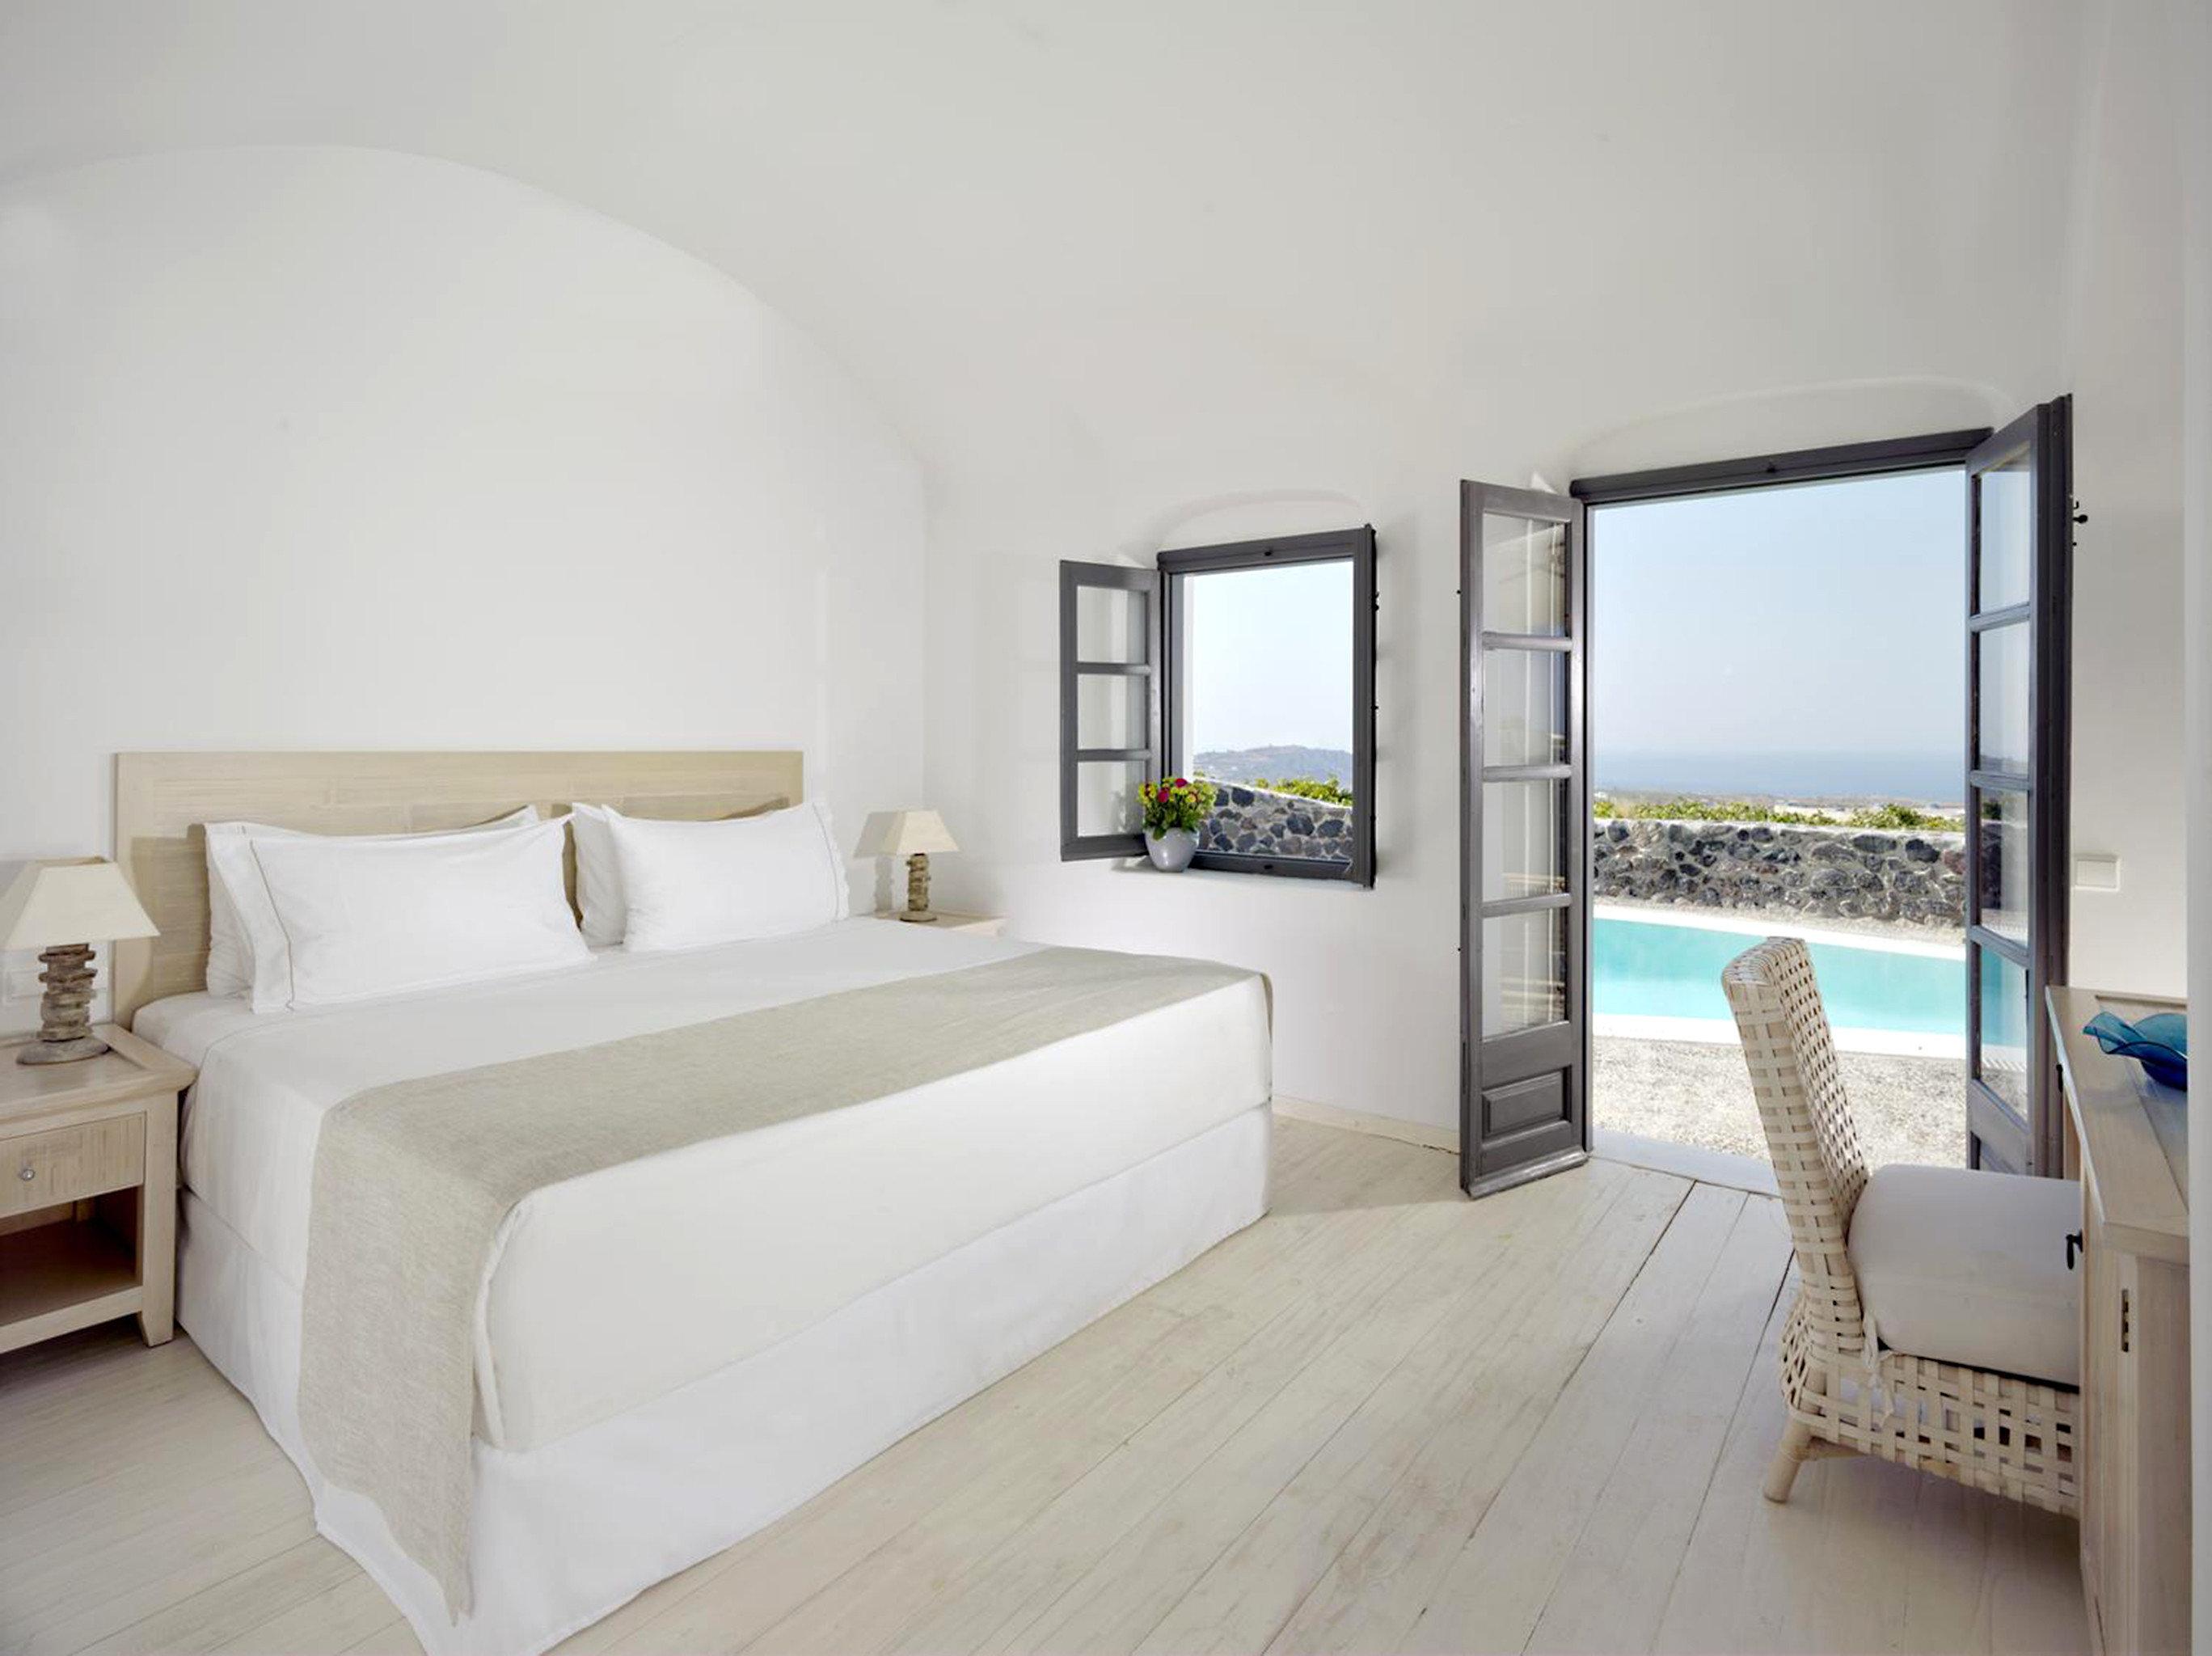 Bedroom Luxury Modern Suite property Villa cottage living room condominium bed frame